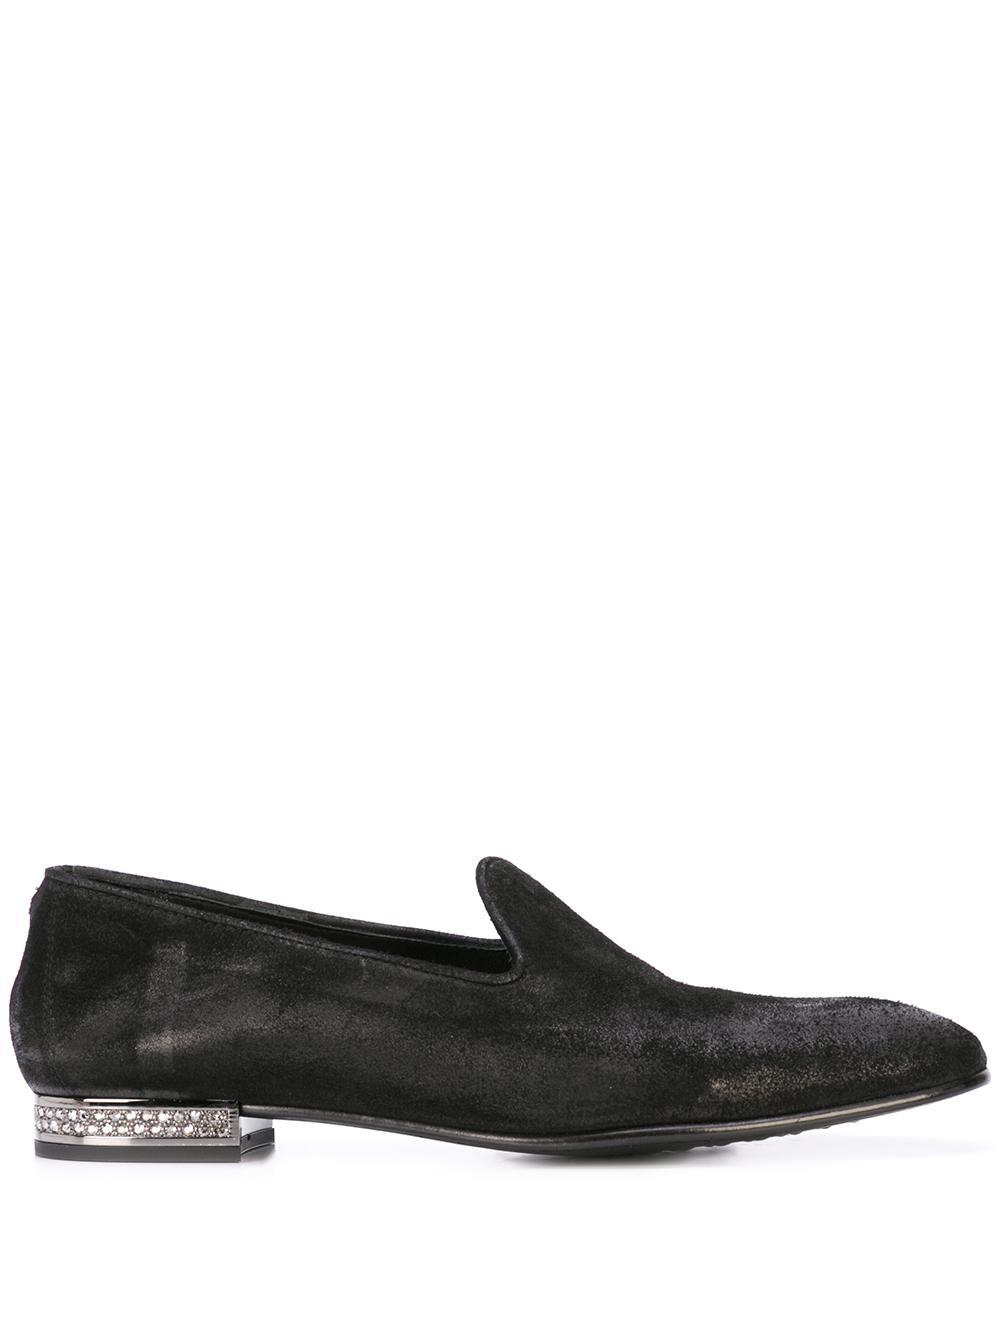 Suede Loafer With Brilliant Heel Item # GARAN